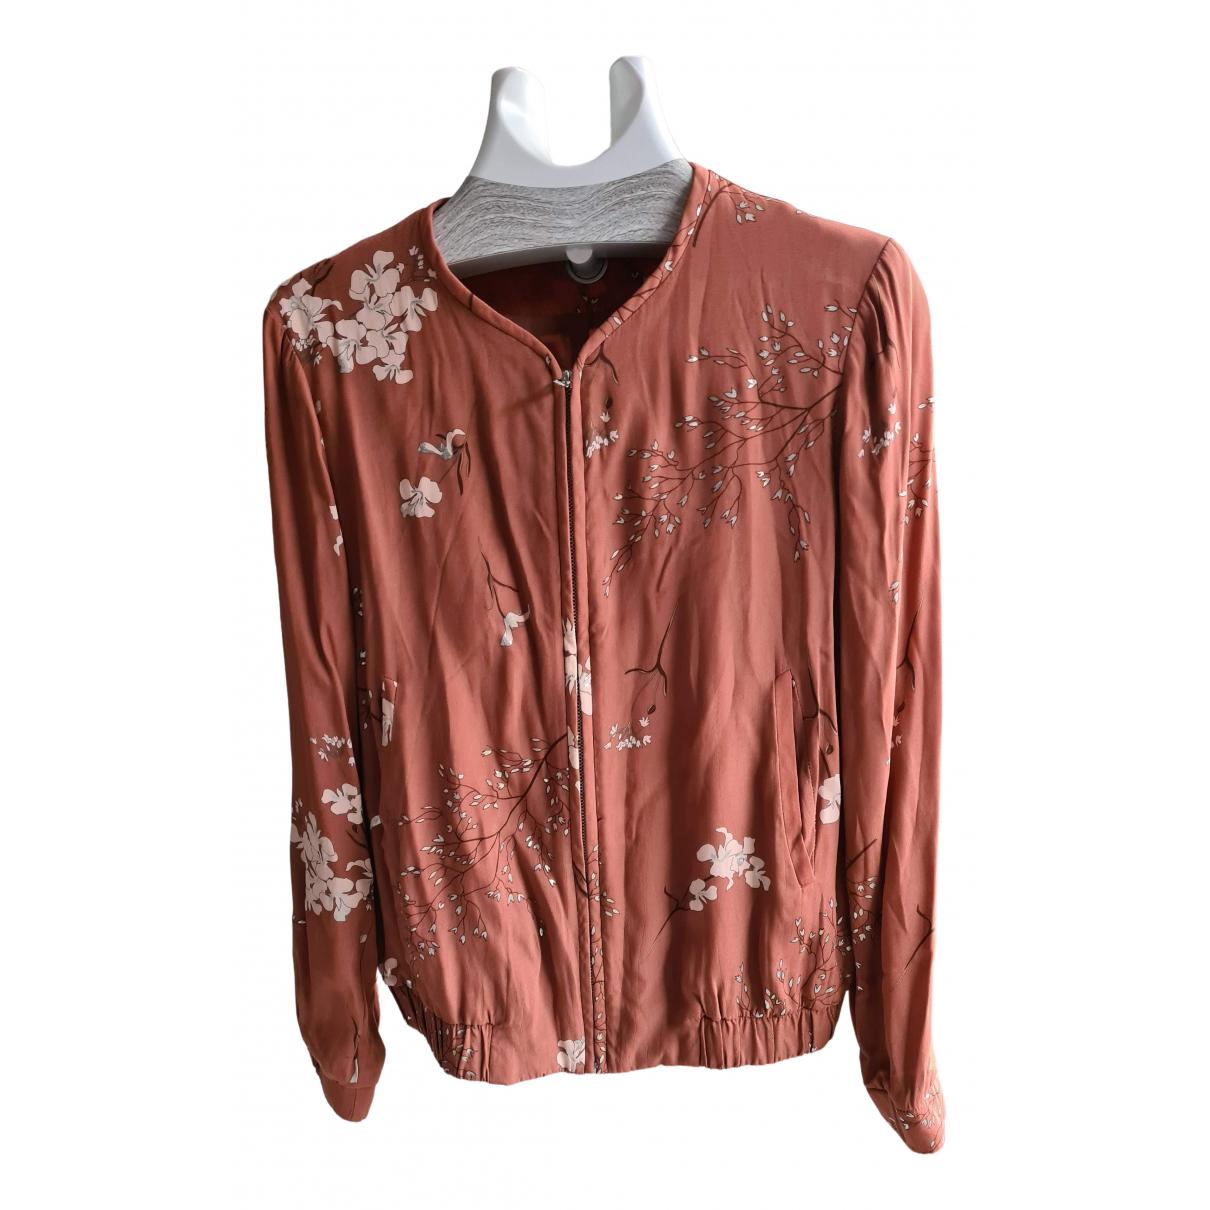 Massimo Dutti N Brown Cotton jacket for Women S International